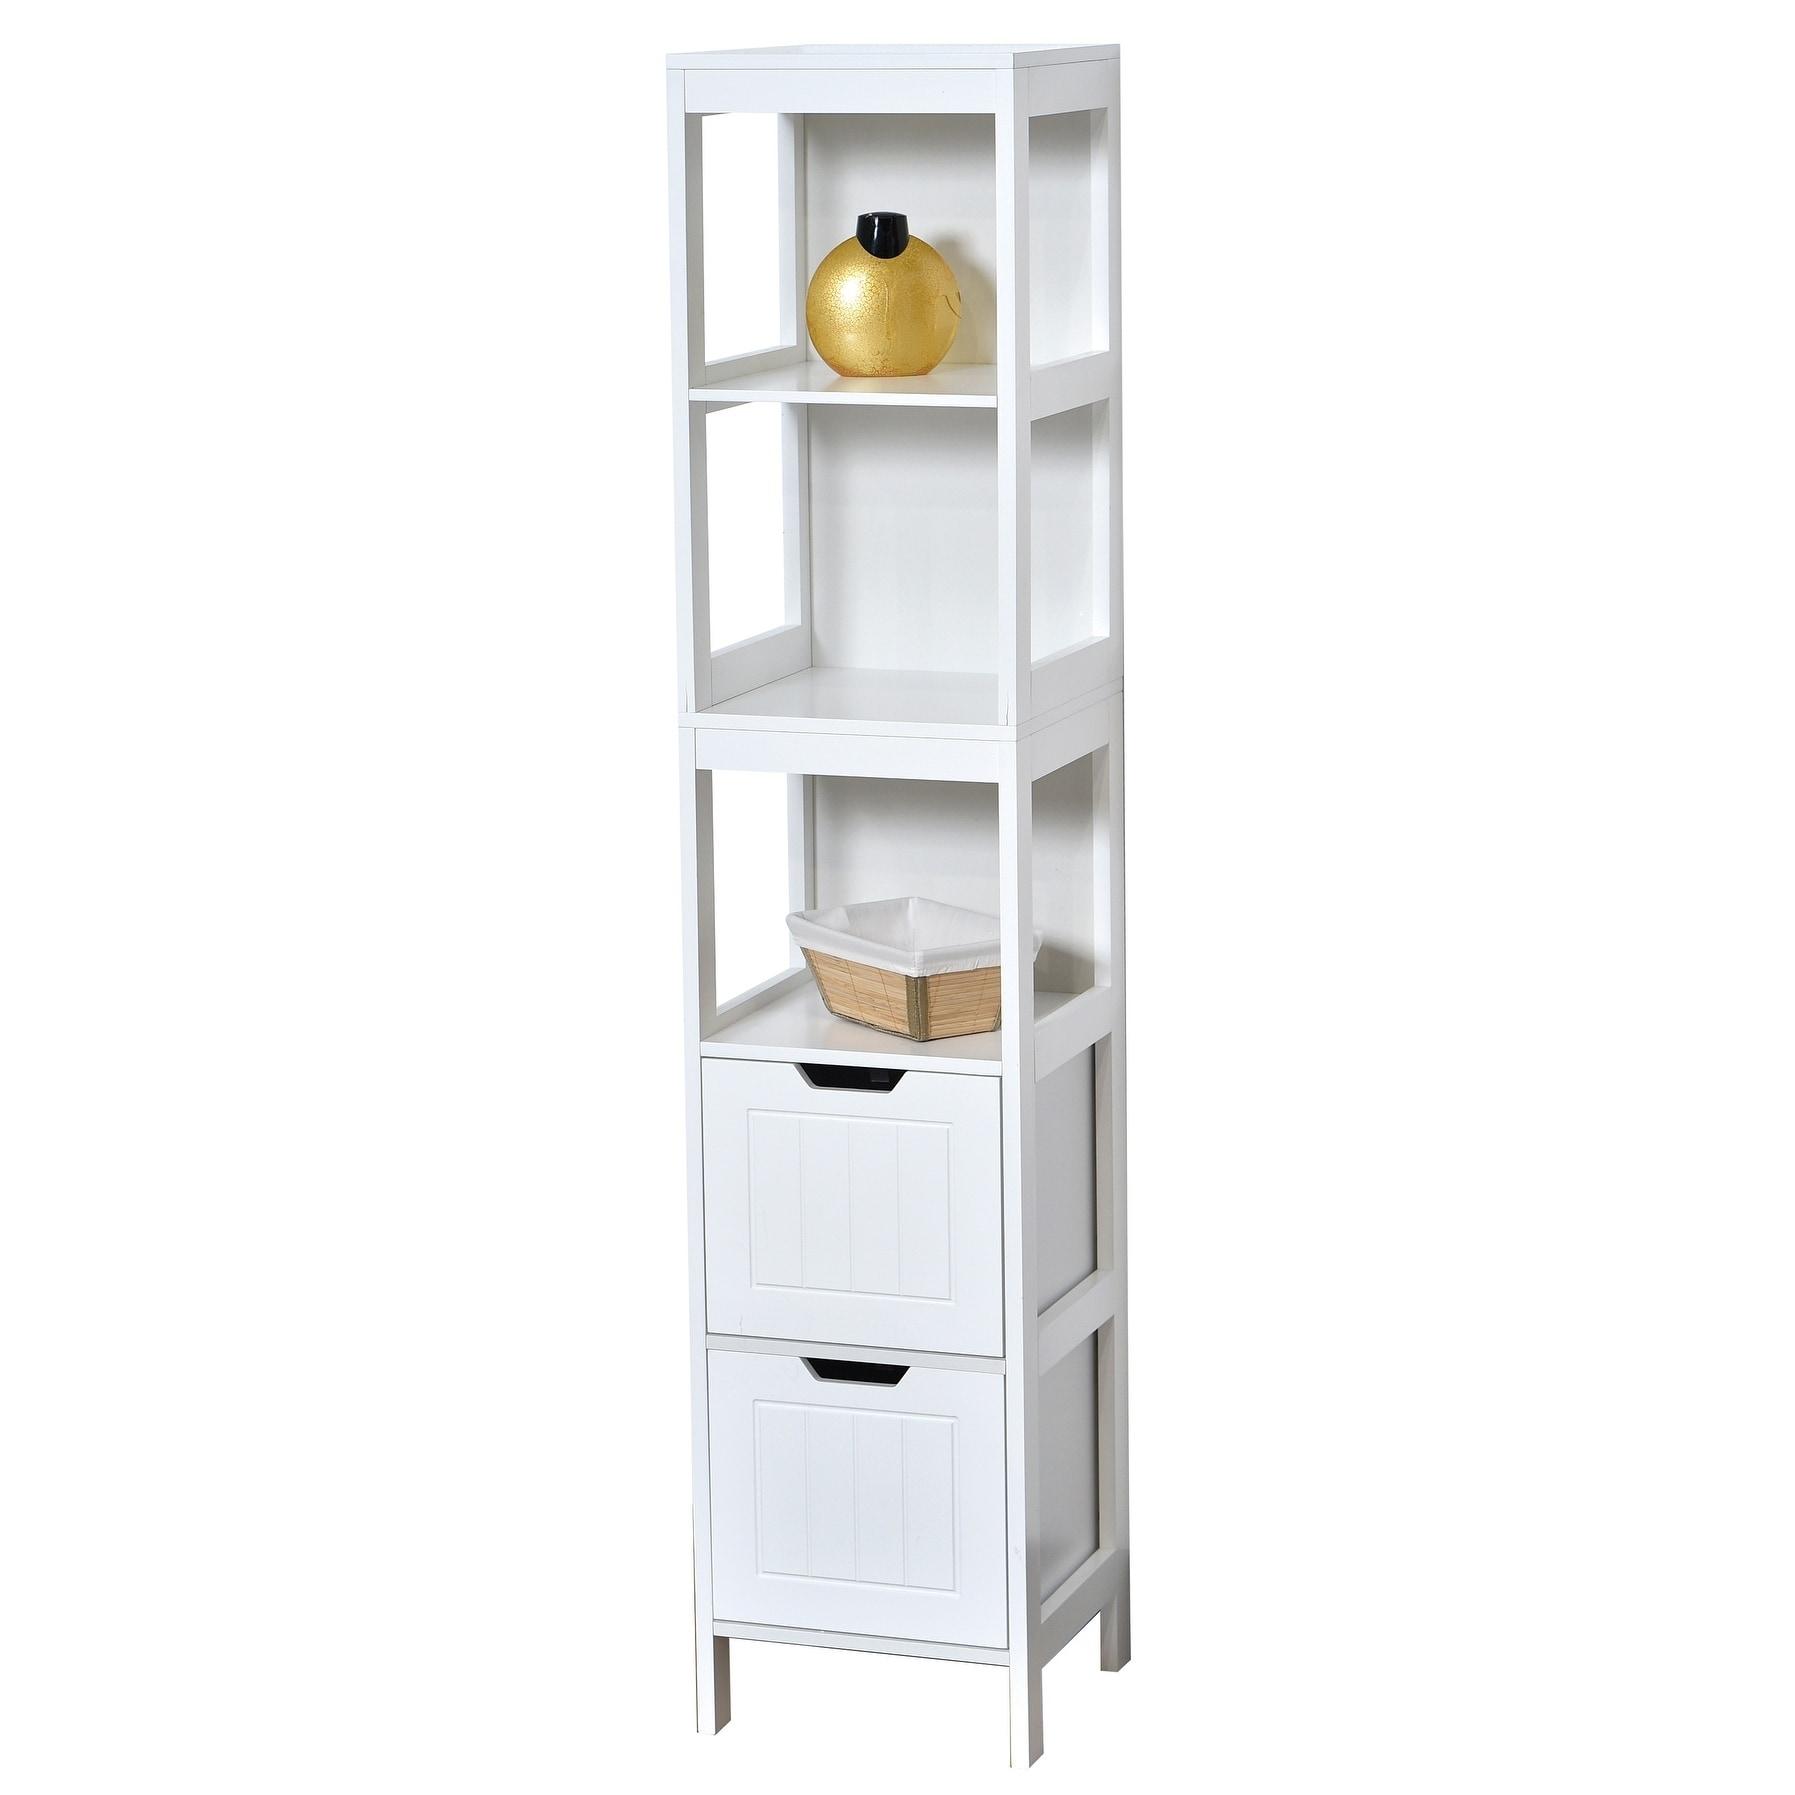 Shop Evideco Bathroom Free Standing Cabinet Linen Tower Cap Ferret ...